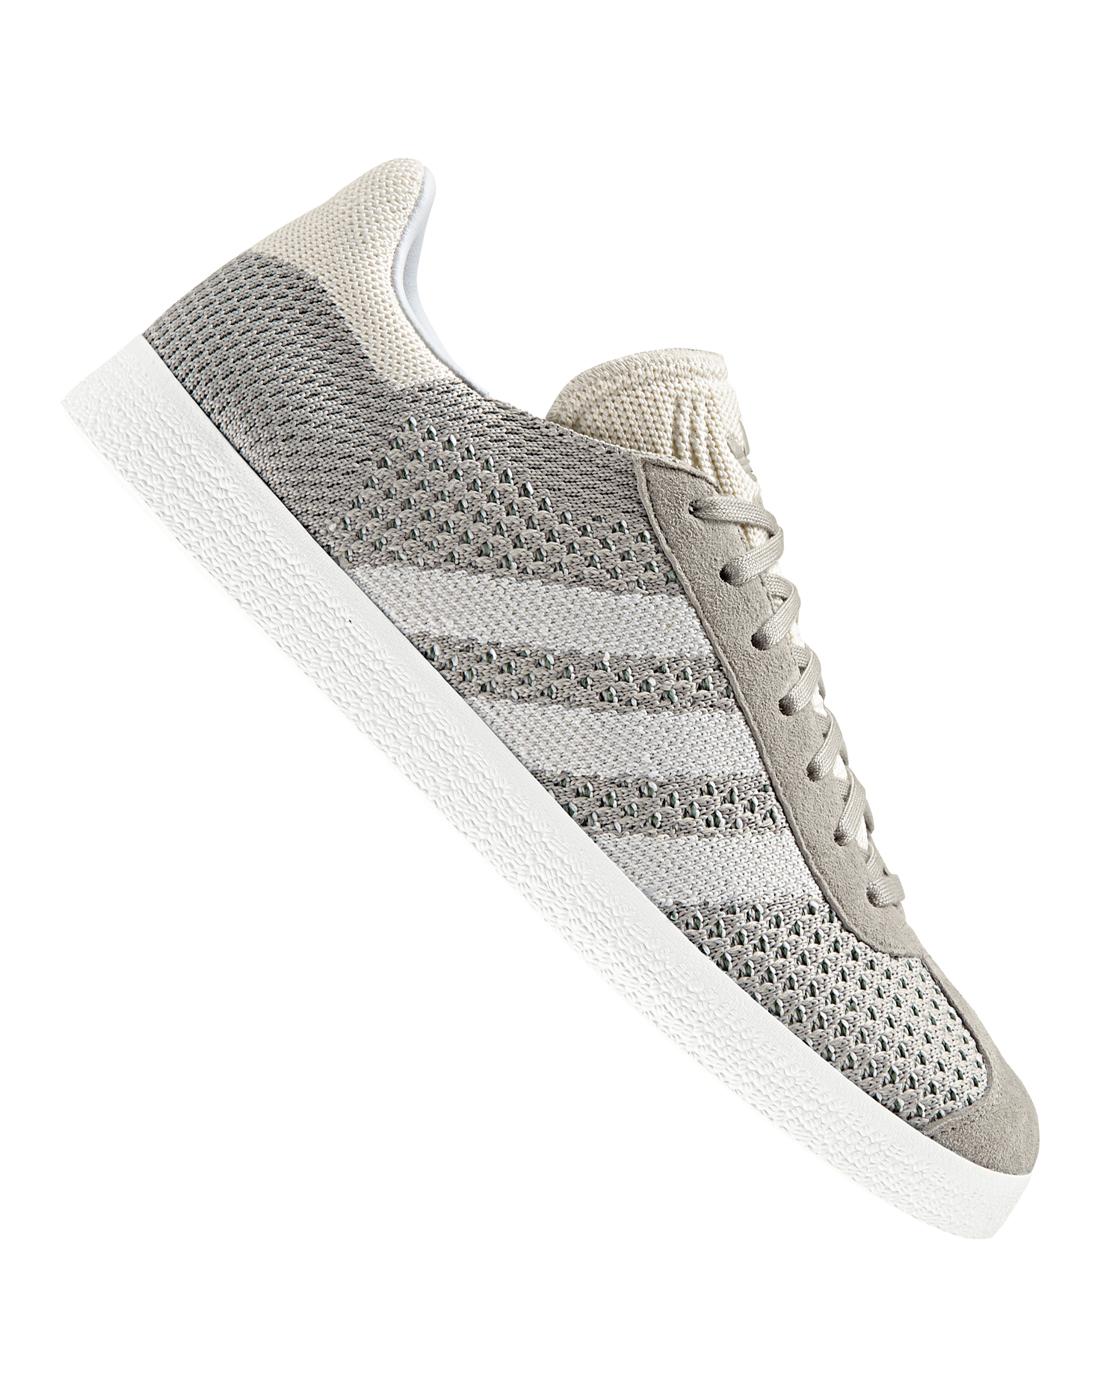 Adidas Originals Gazelle Pk Online Hotsell, UP TO 59% OFF